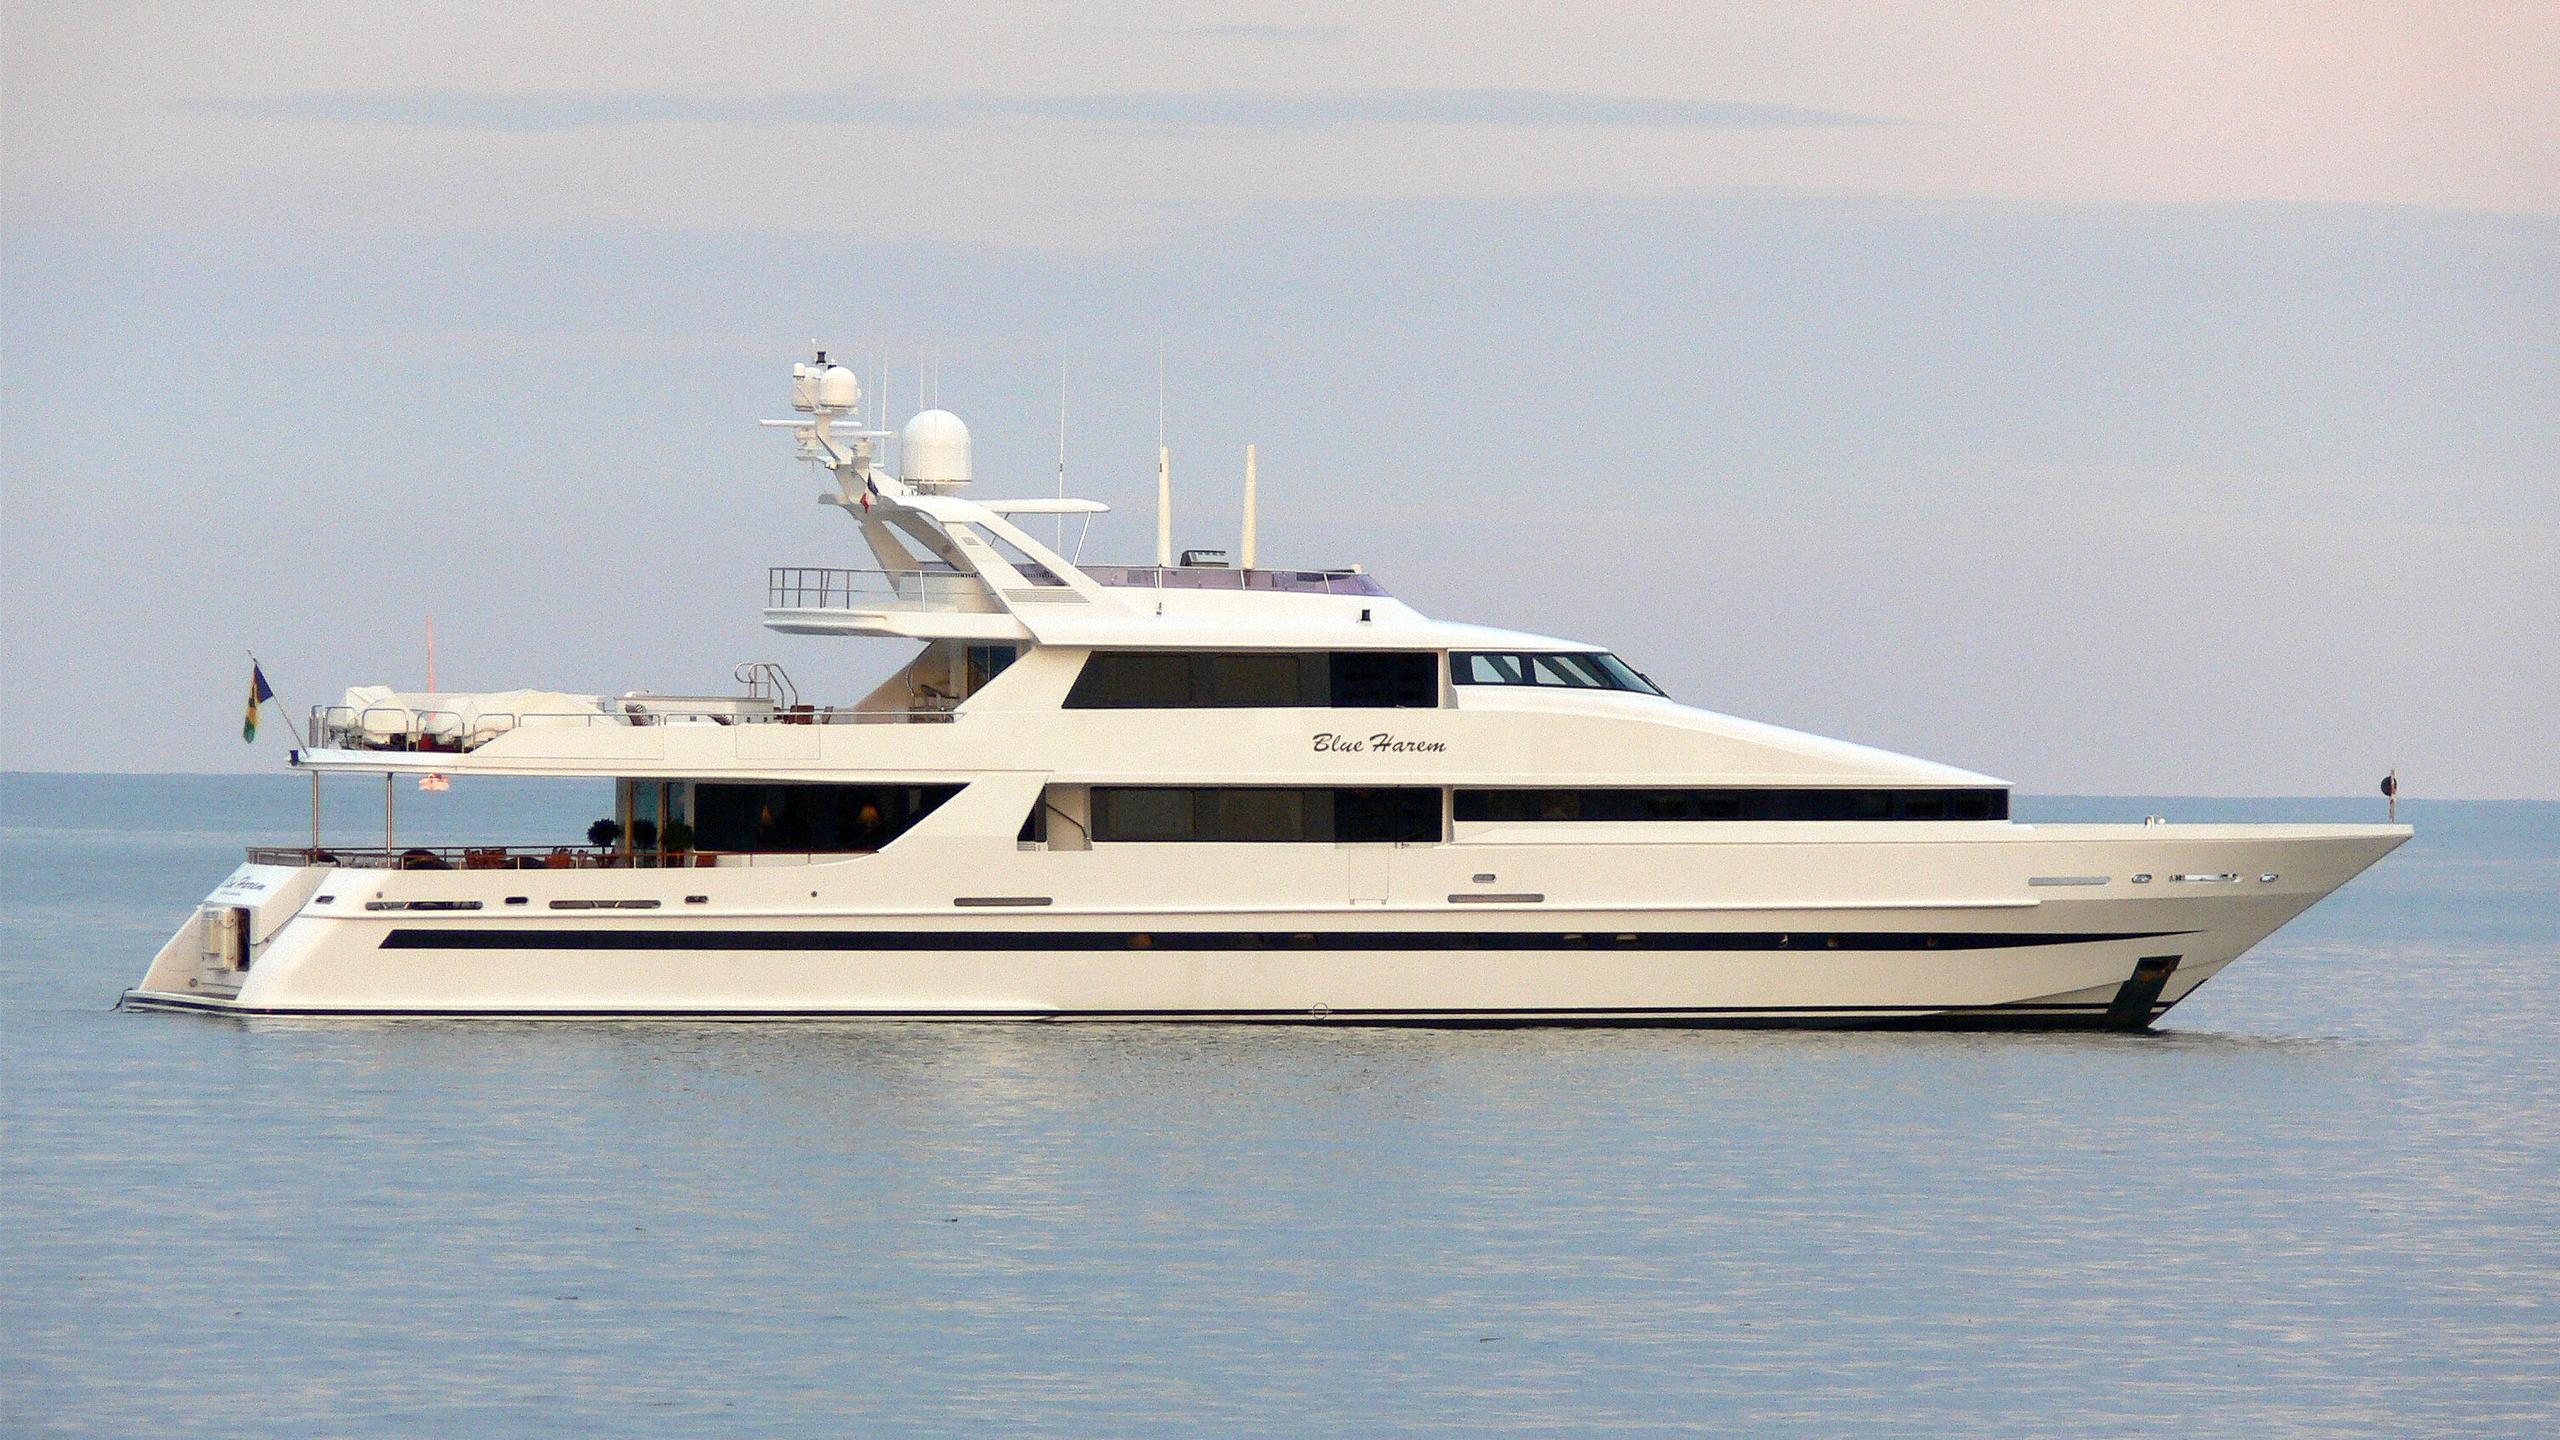 life-saga-motor-yacht-heesen-1994-42m-profile-before-refit